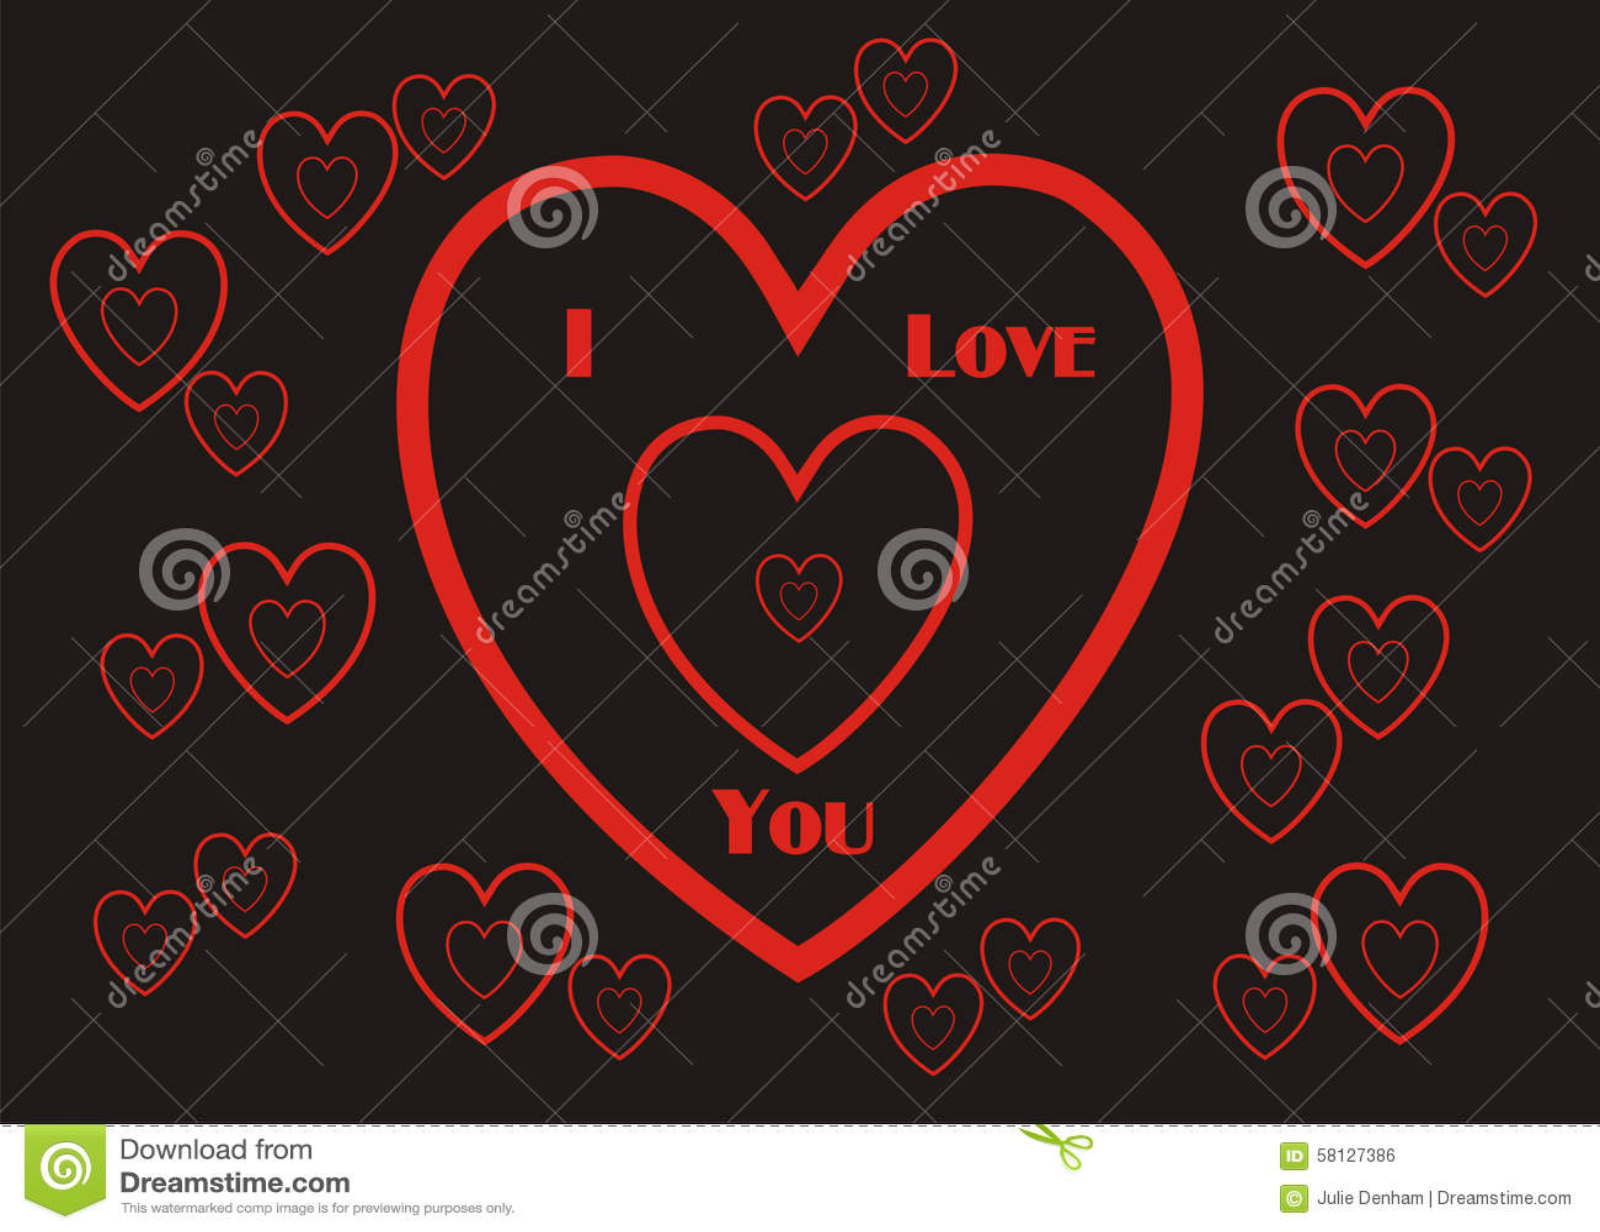 I Love You Imágenes De Stock I Love You Fotos De Stock: I Love You Wallpaper Background Giftwrap Stock